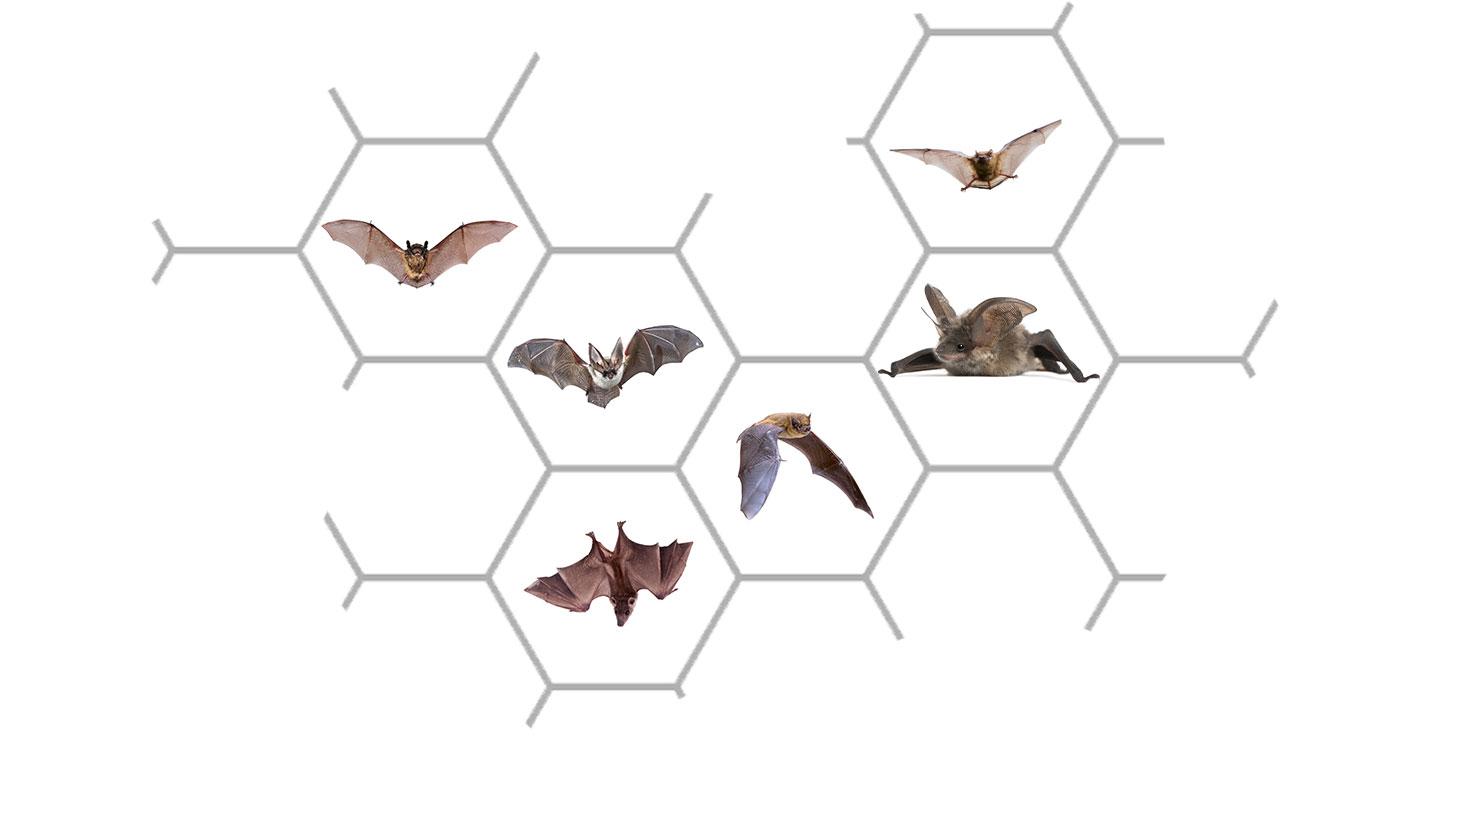 Bat Control Service: Bat Exclusion